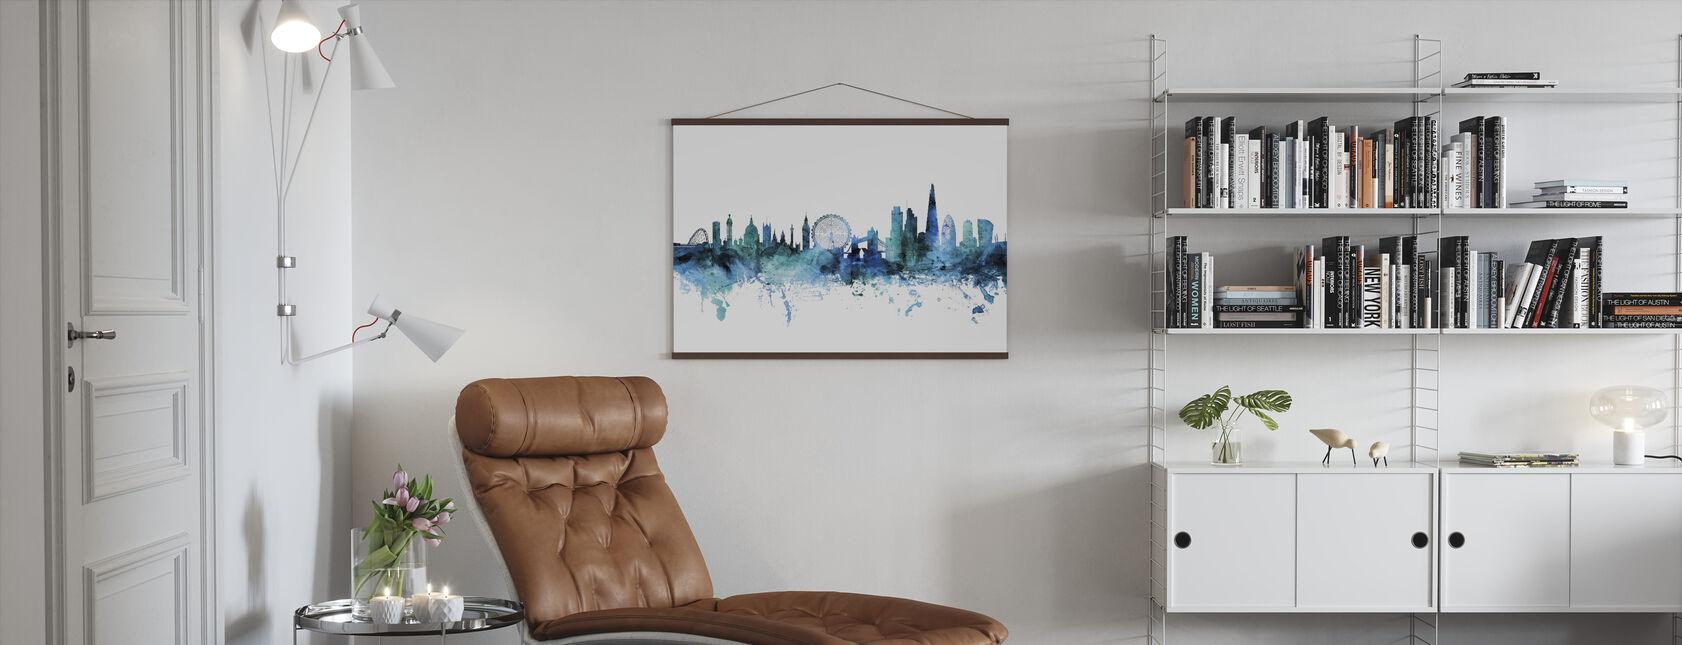 London England Skyline - Poster - Living Room